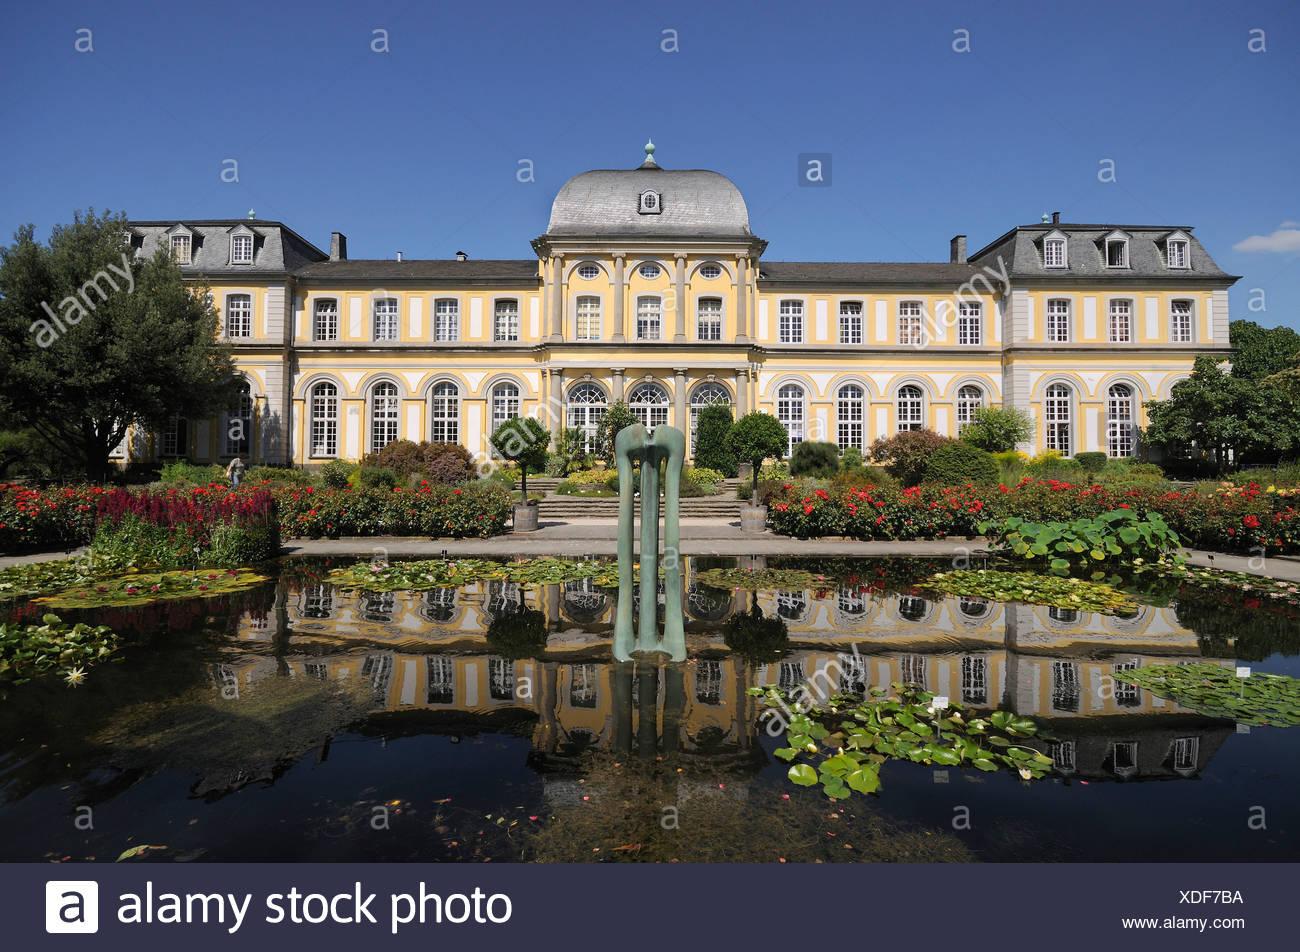 Botanischer Garten, Bonn-Poppelsdorf, Bonn, Nordrhein-Westfalen Stockbild